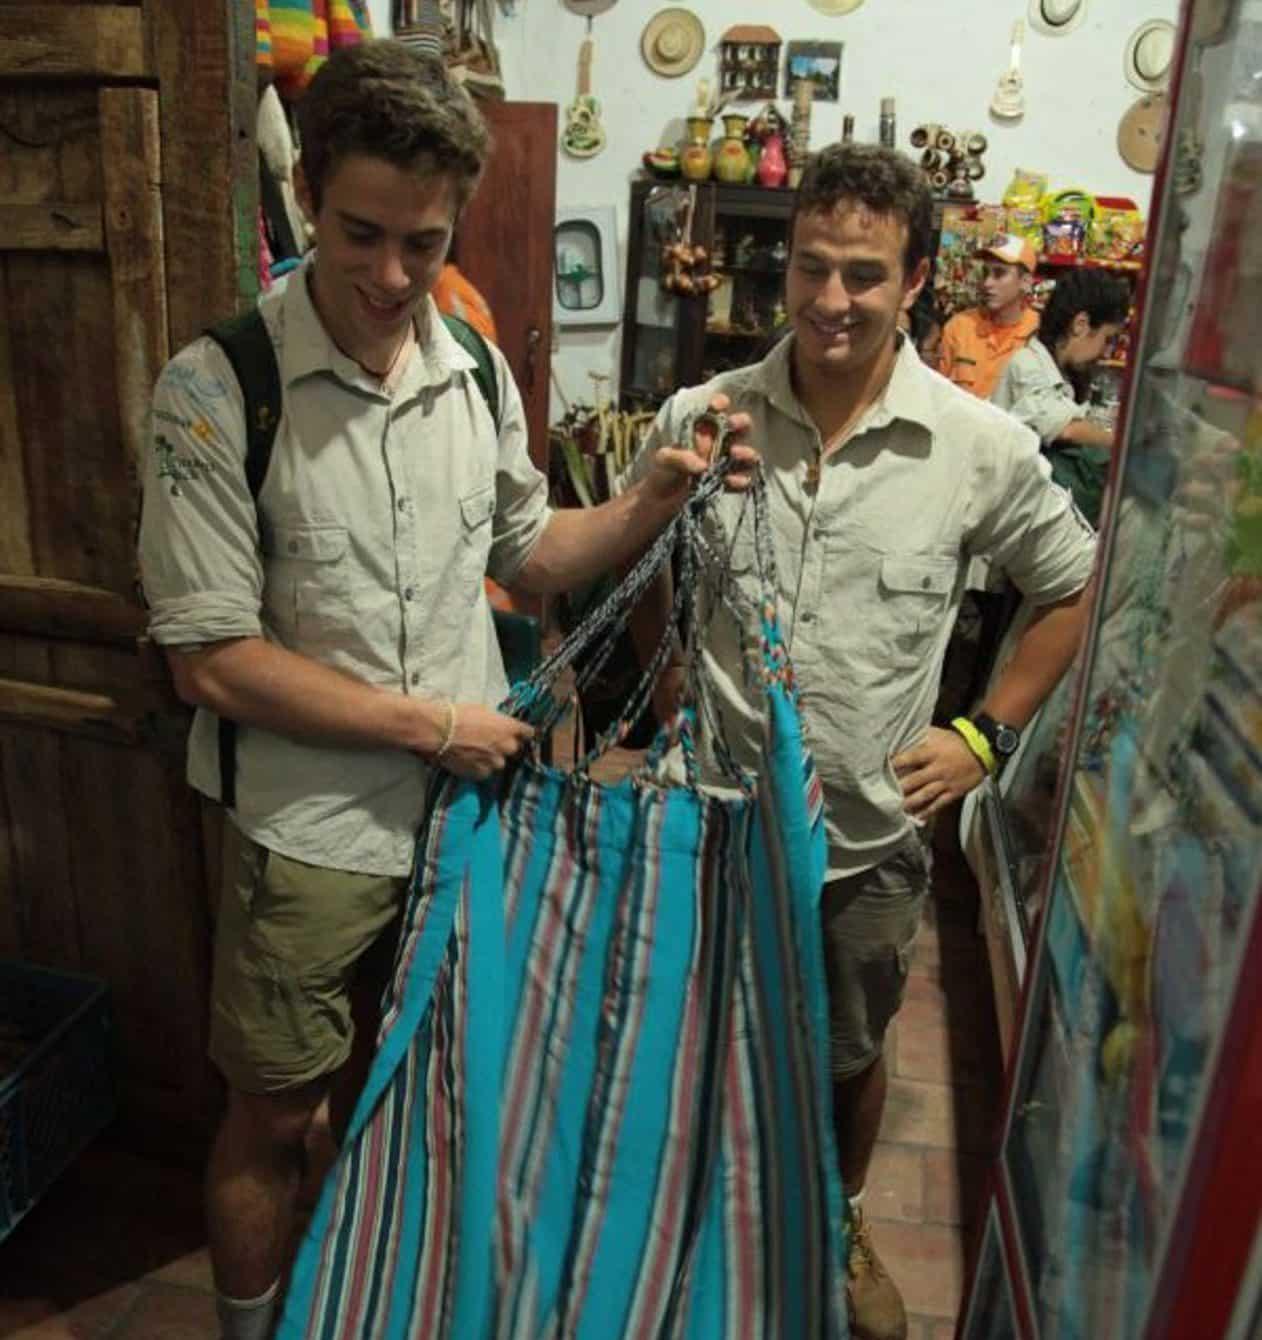 rota quetzal-hammock-travel-no-money